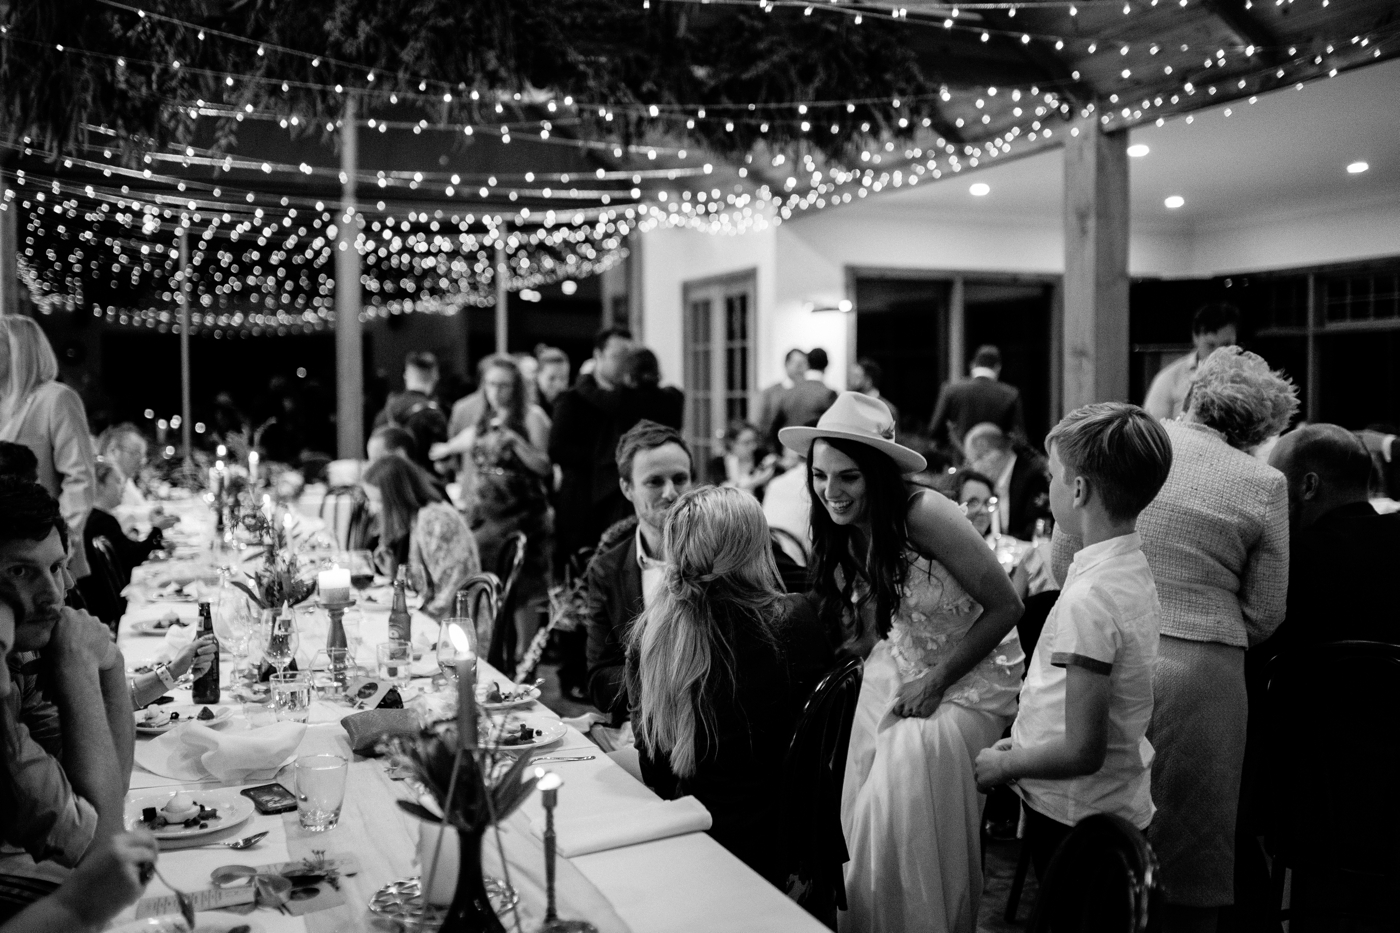 Maddy & Wes - K1 by Geoff Hardy Wedding - Adelaide Wedding Photographer - Natural wedding photography in Adelaide - Katherine Schultz_0079.jpg